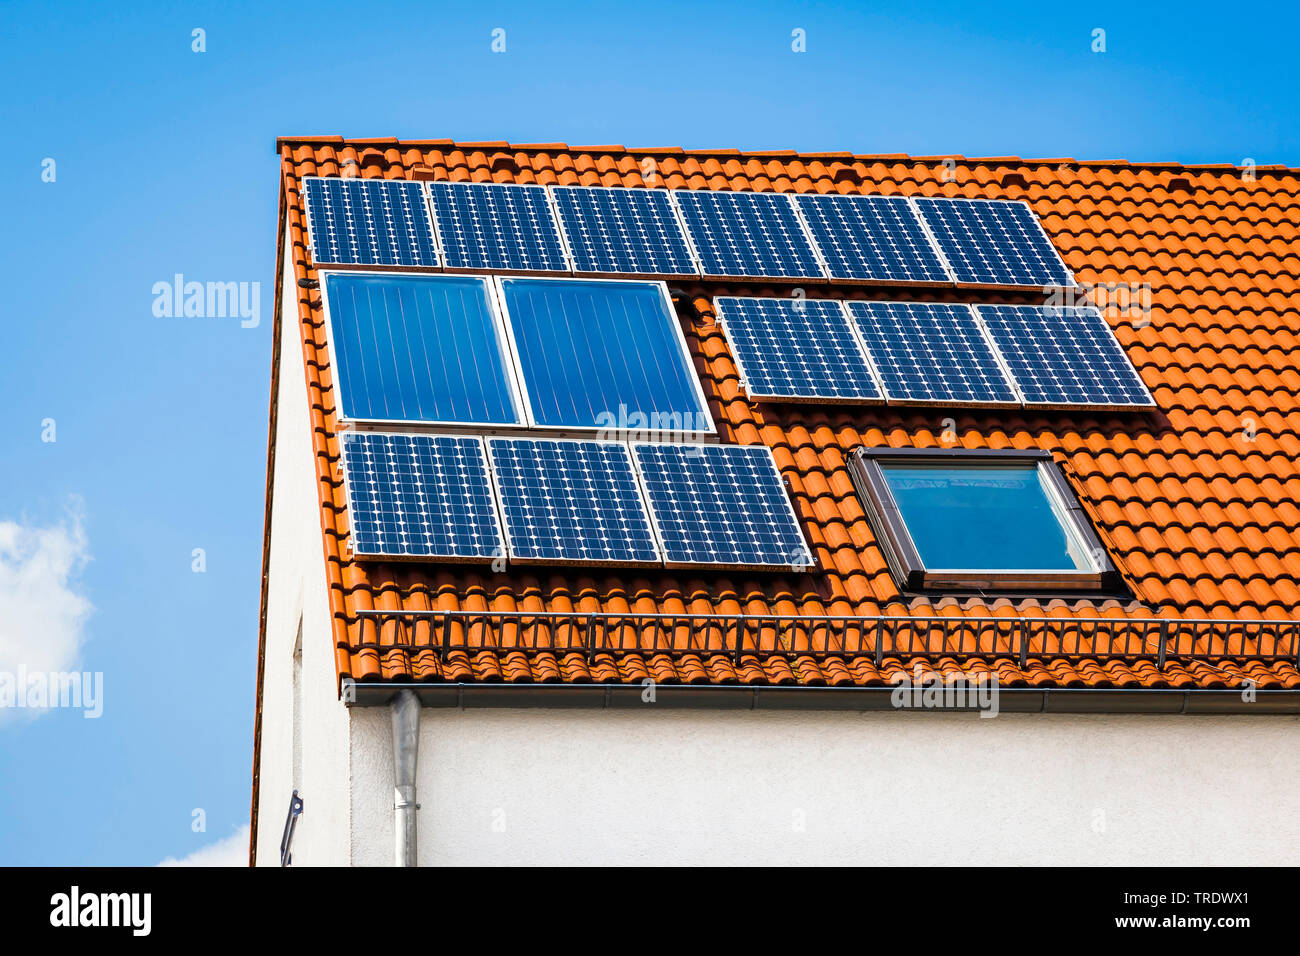 Detailaufnahme eines Hausdachs mit Solarzellen  | Detail of residental house roof with solar panels | BLWS511241.jpg [ (c) blickwinkel/McPHOTO/M. Gann - Stock Image